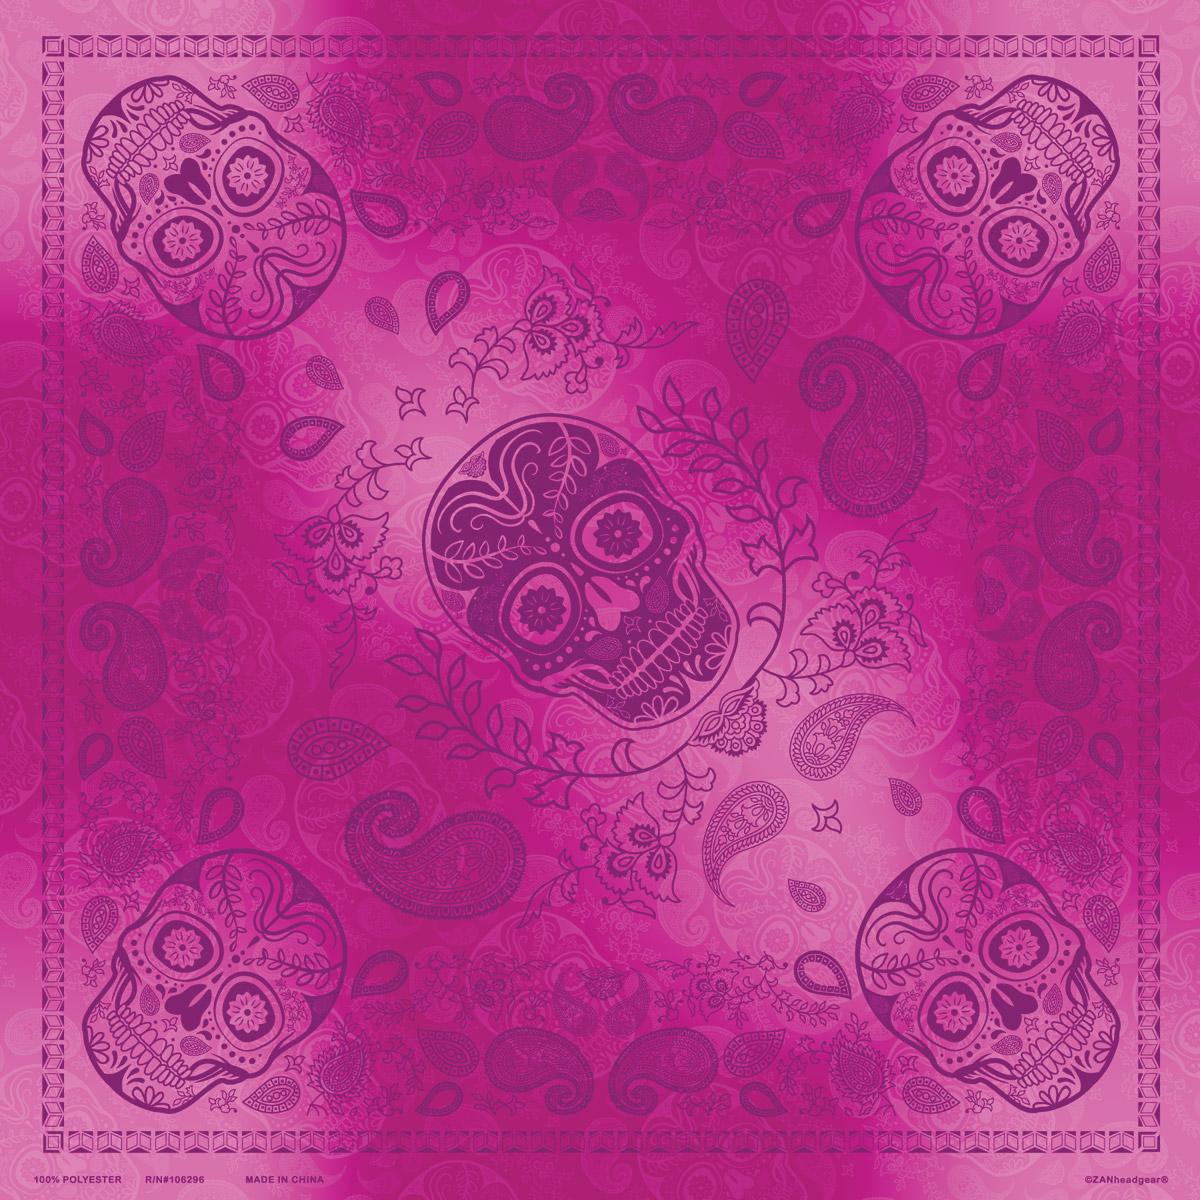 ZAN headgear Pink and Purple Skull Paisley Deluxe Bandana